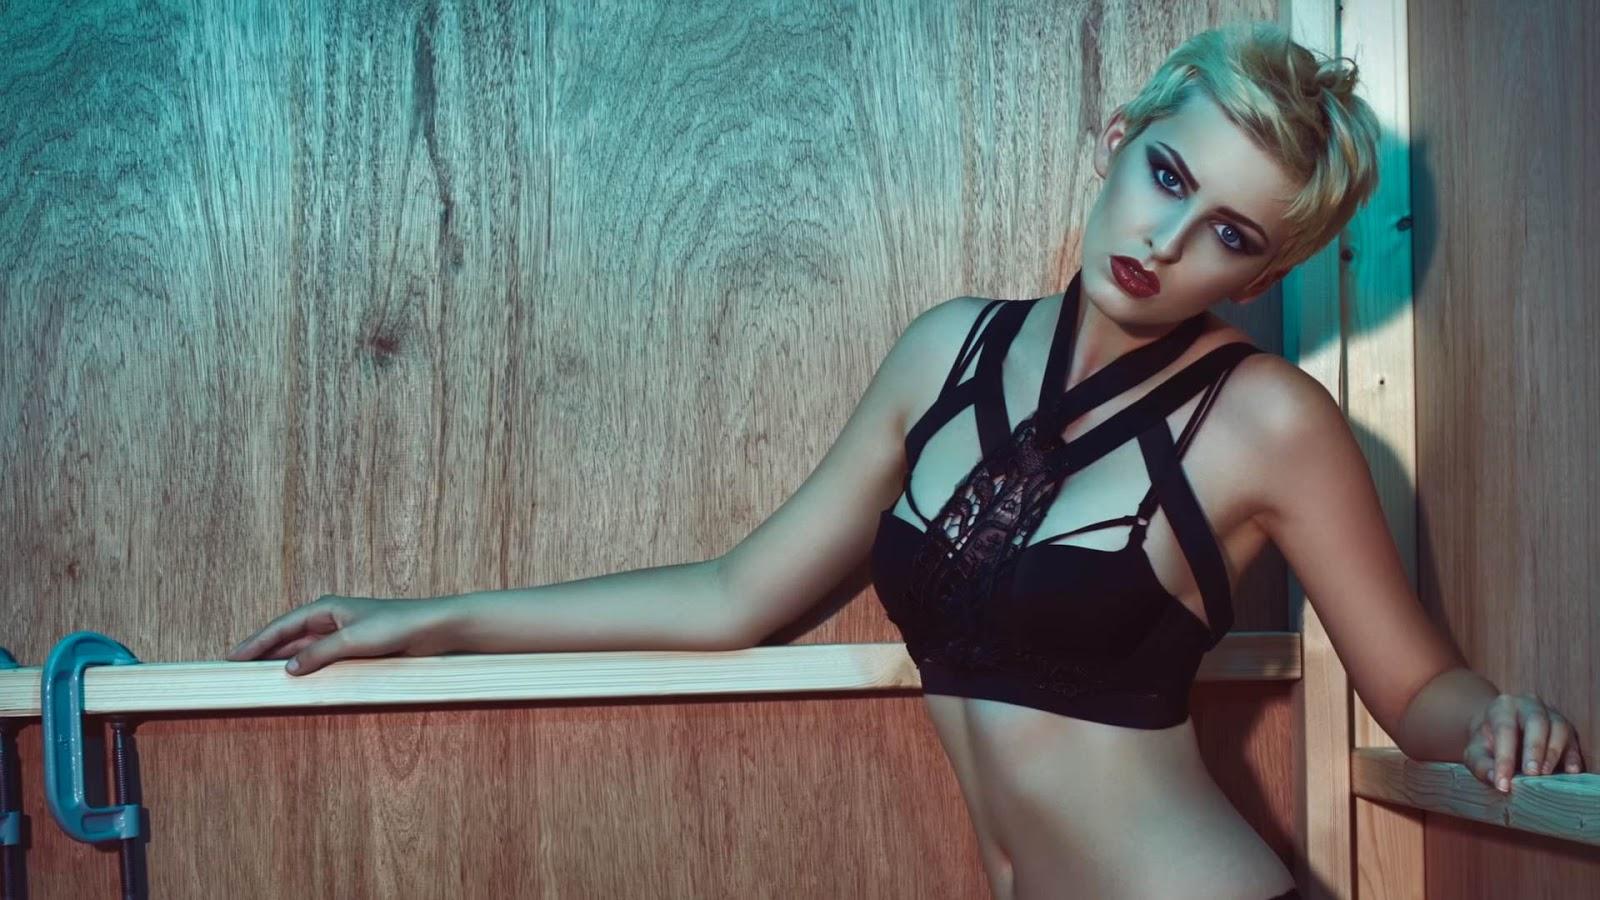 How to shoot alternative fashion with Julian Kilsby